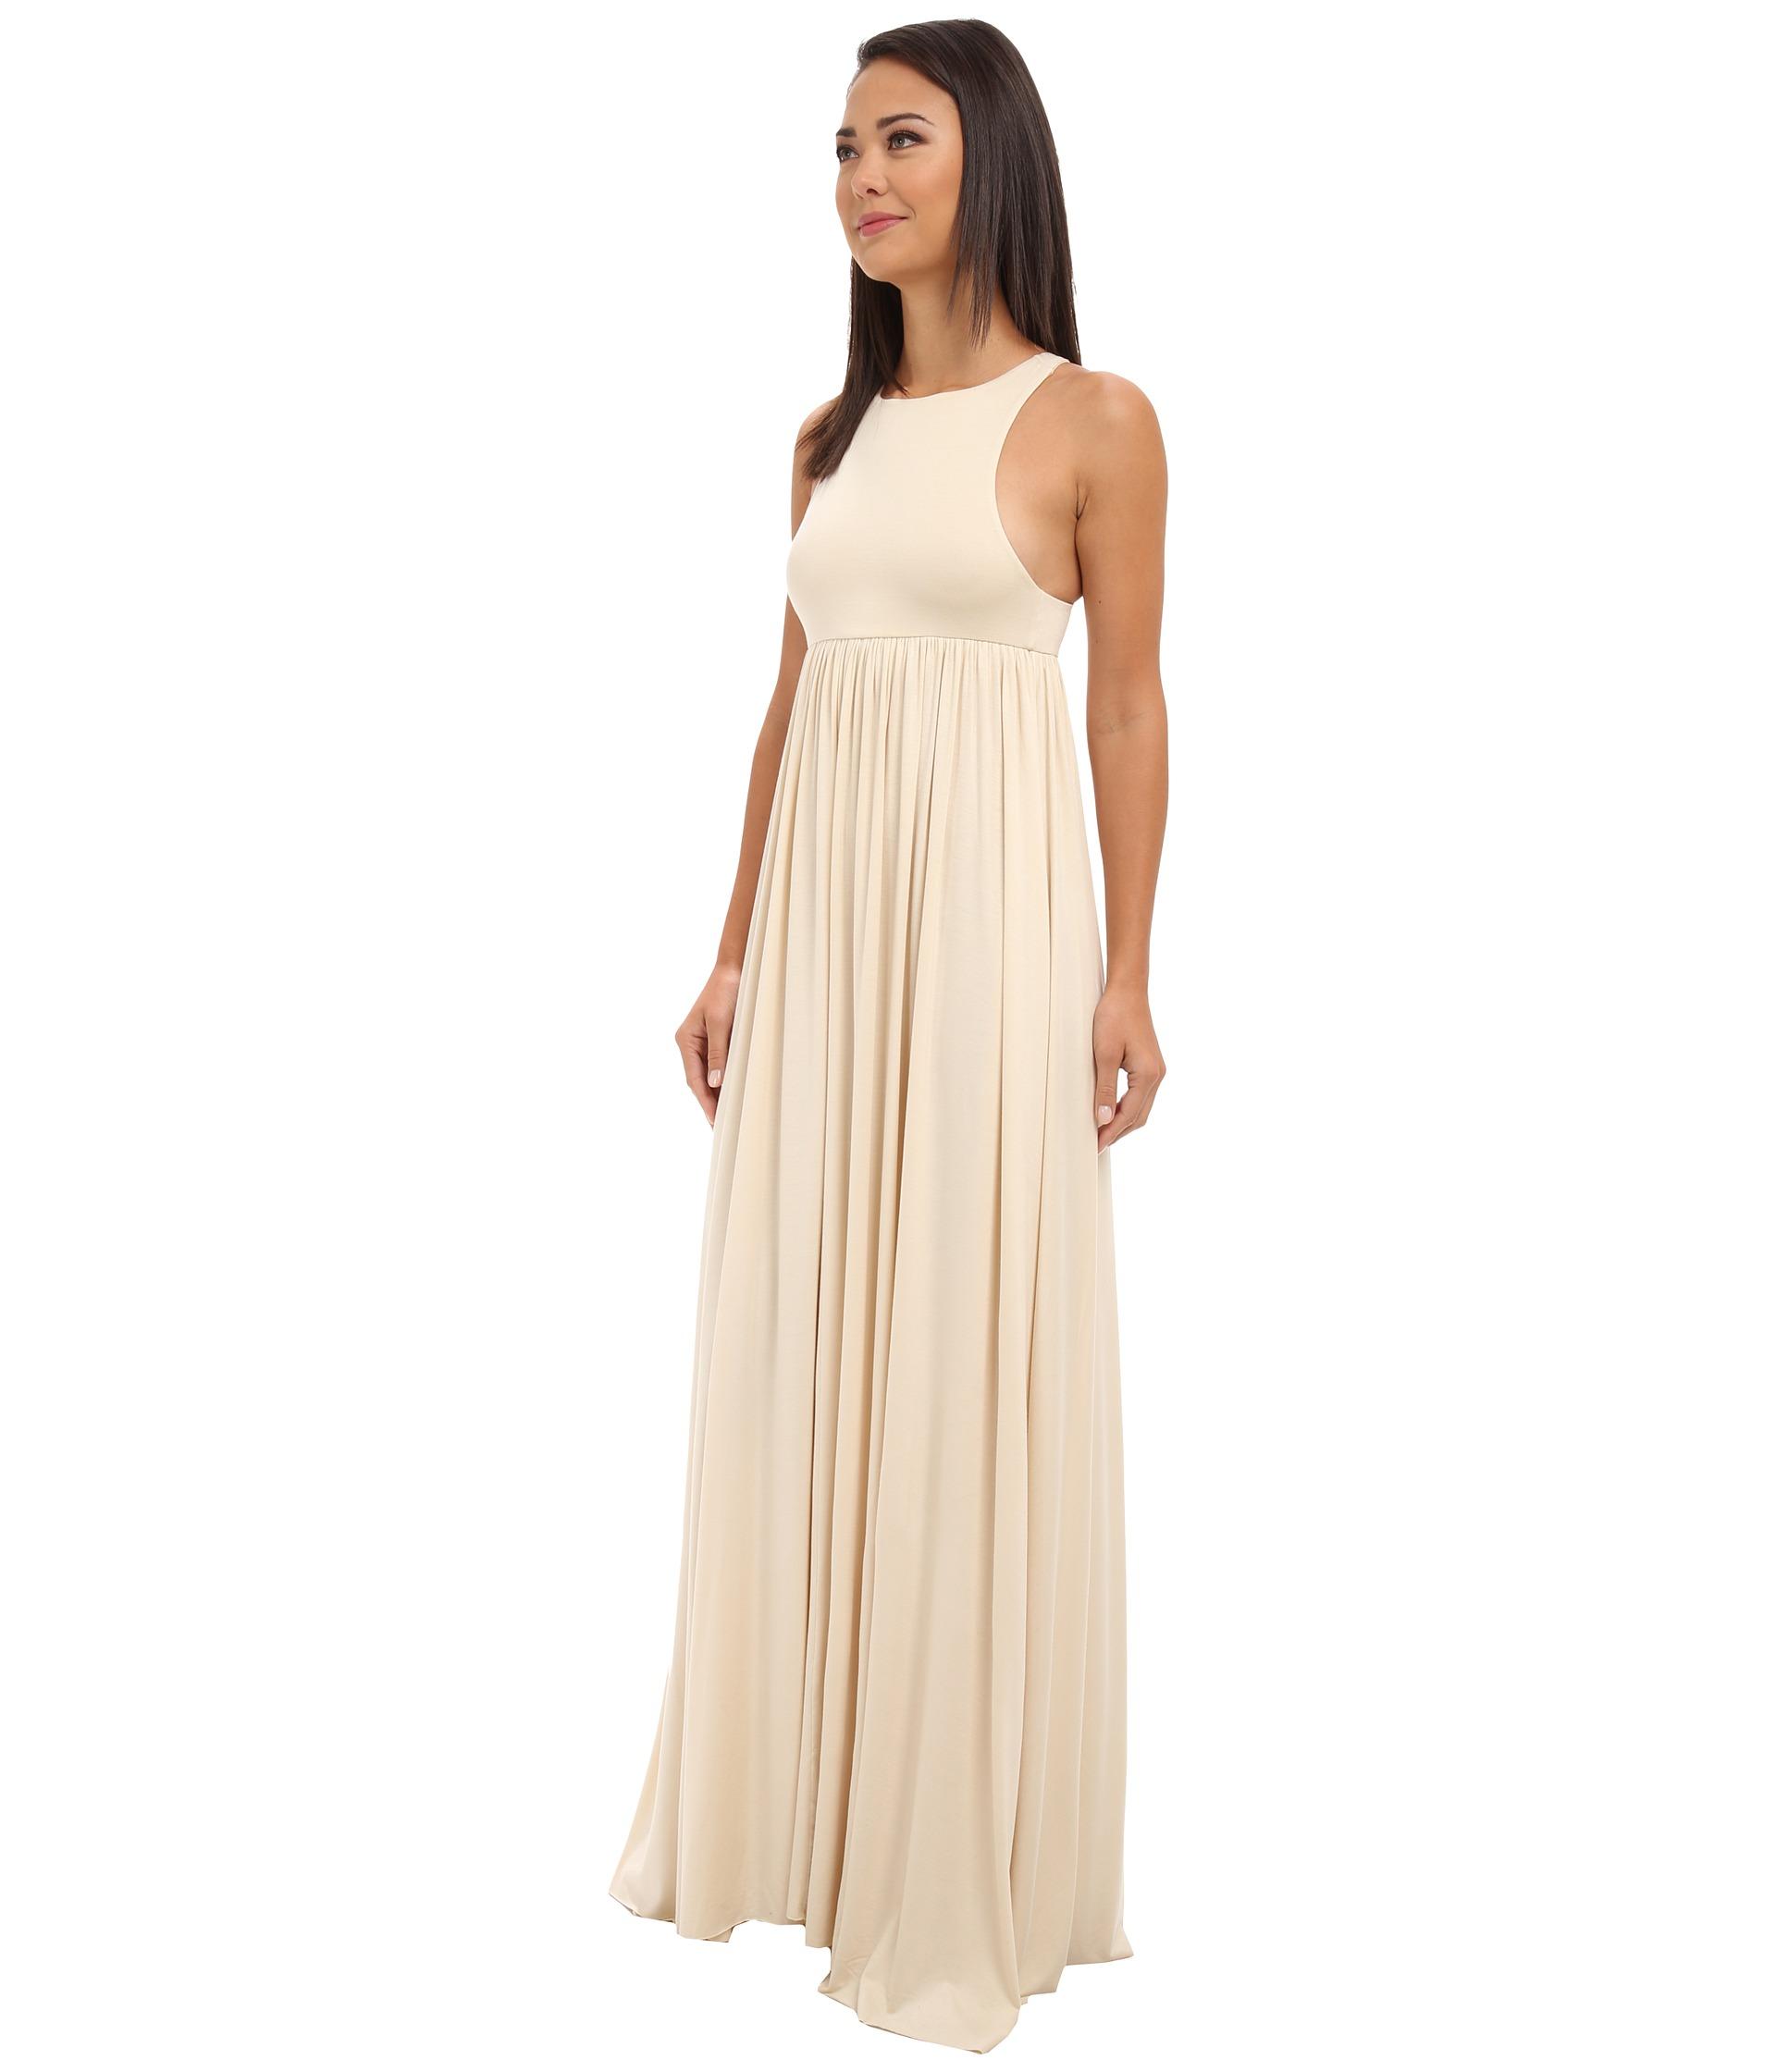 Rachel Pally Anya Dress - Zappos.com Free Shipping BOTH Ways